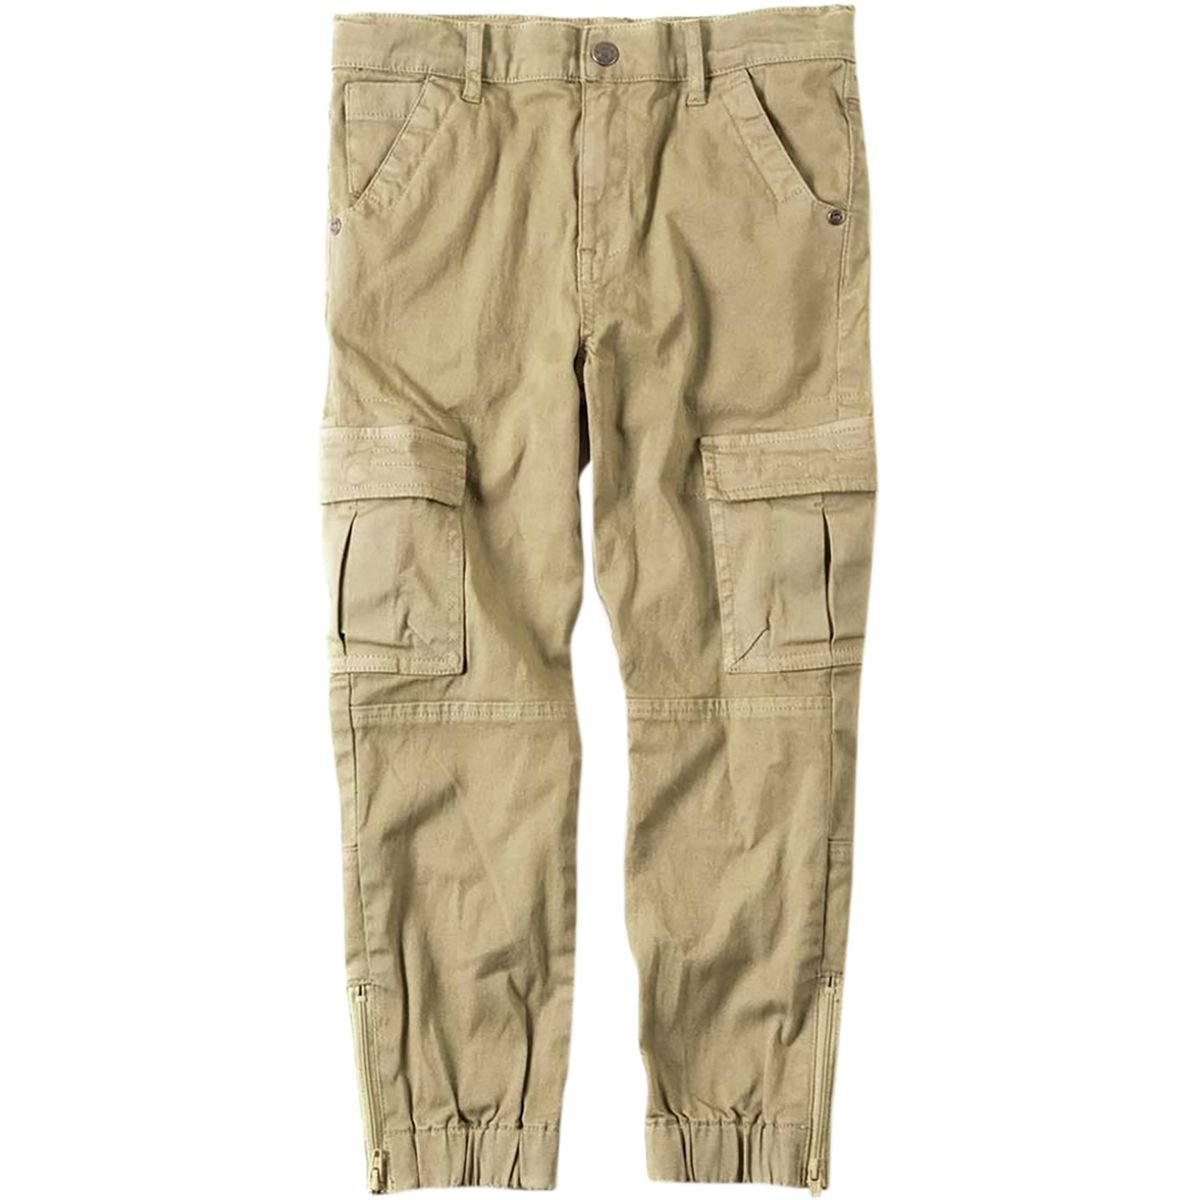 Appaman Kids Mens Soft Skinny Cargo York Pants Toddler//Little Kids//Big Kids